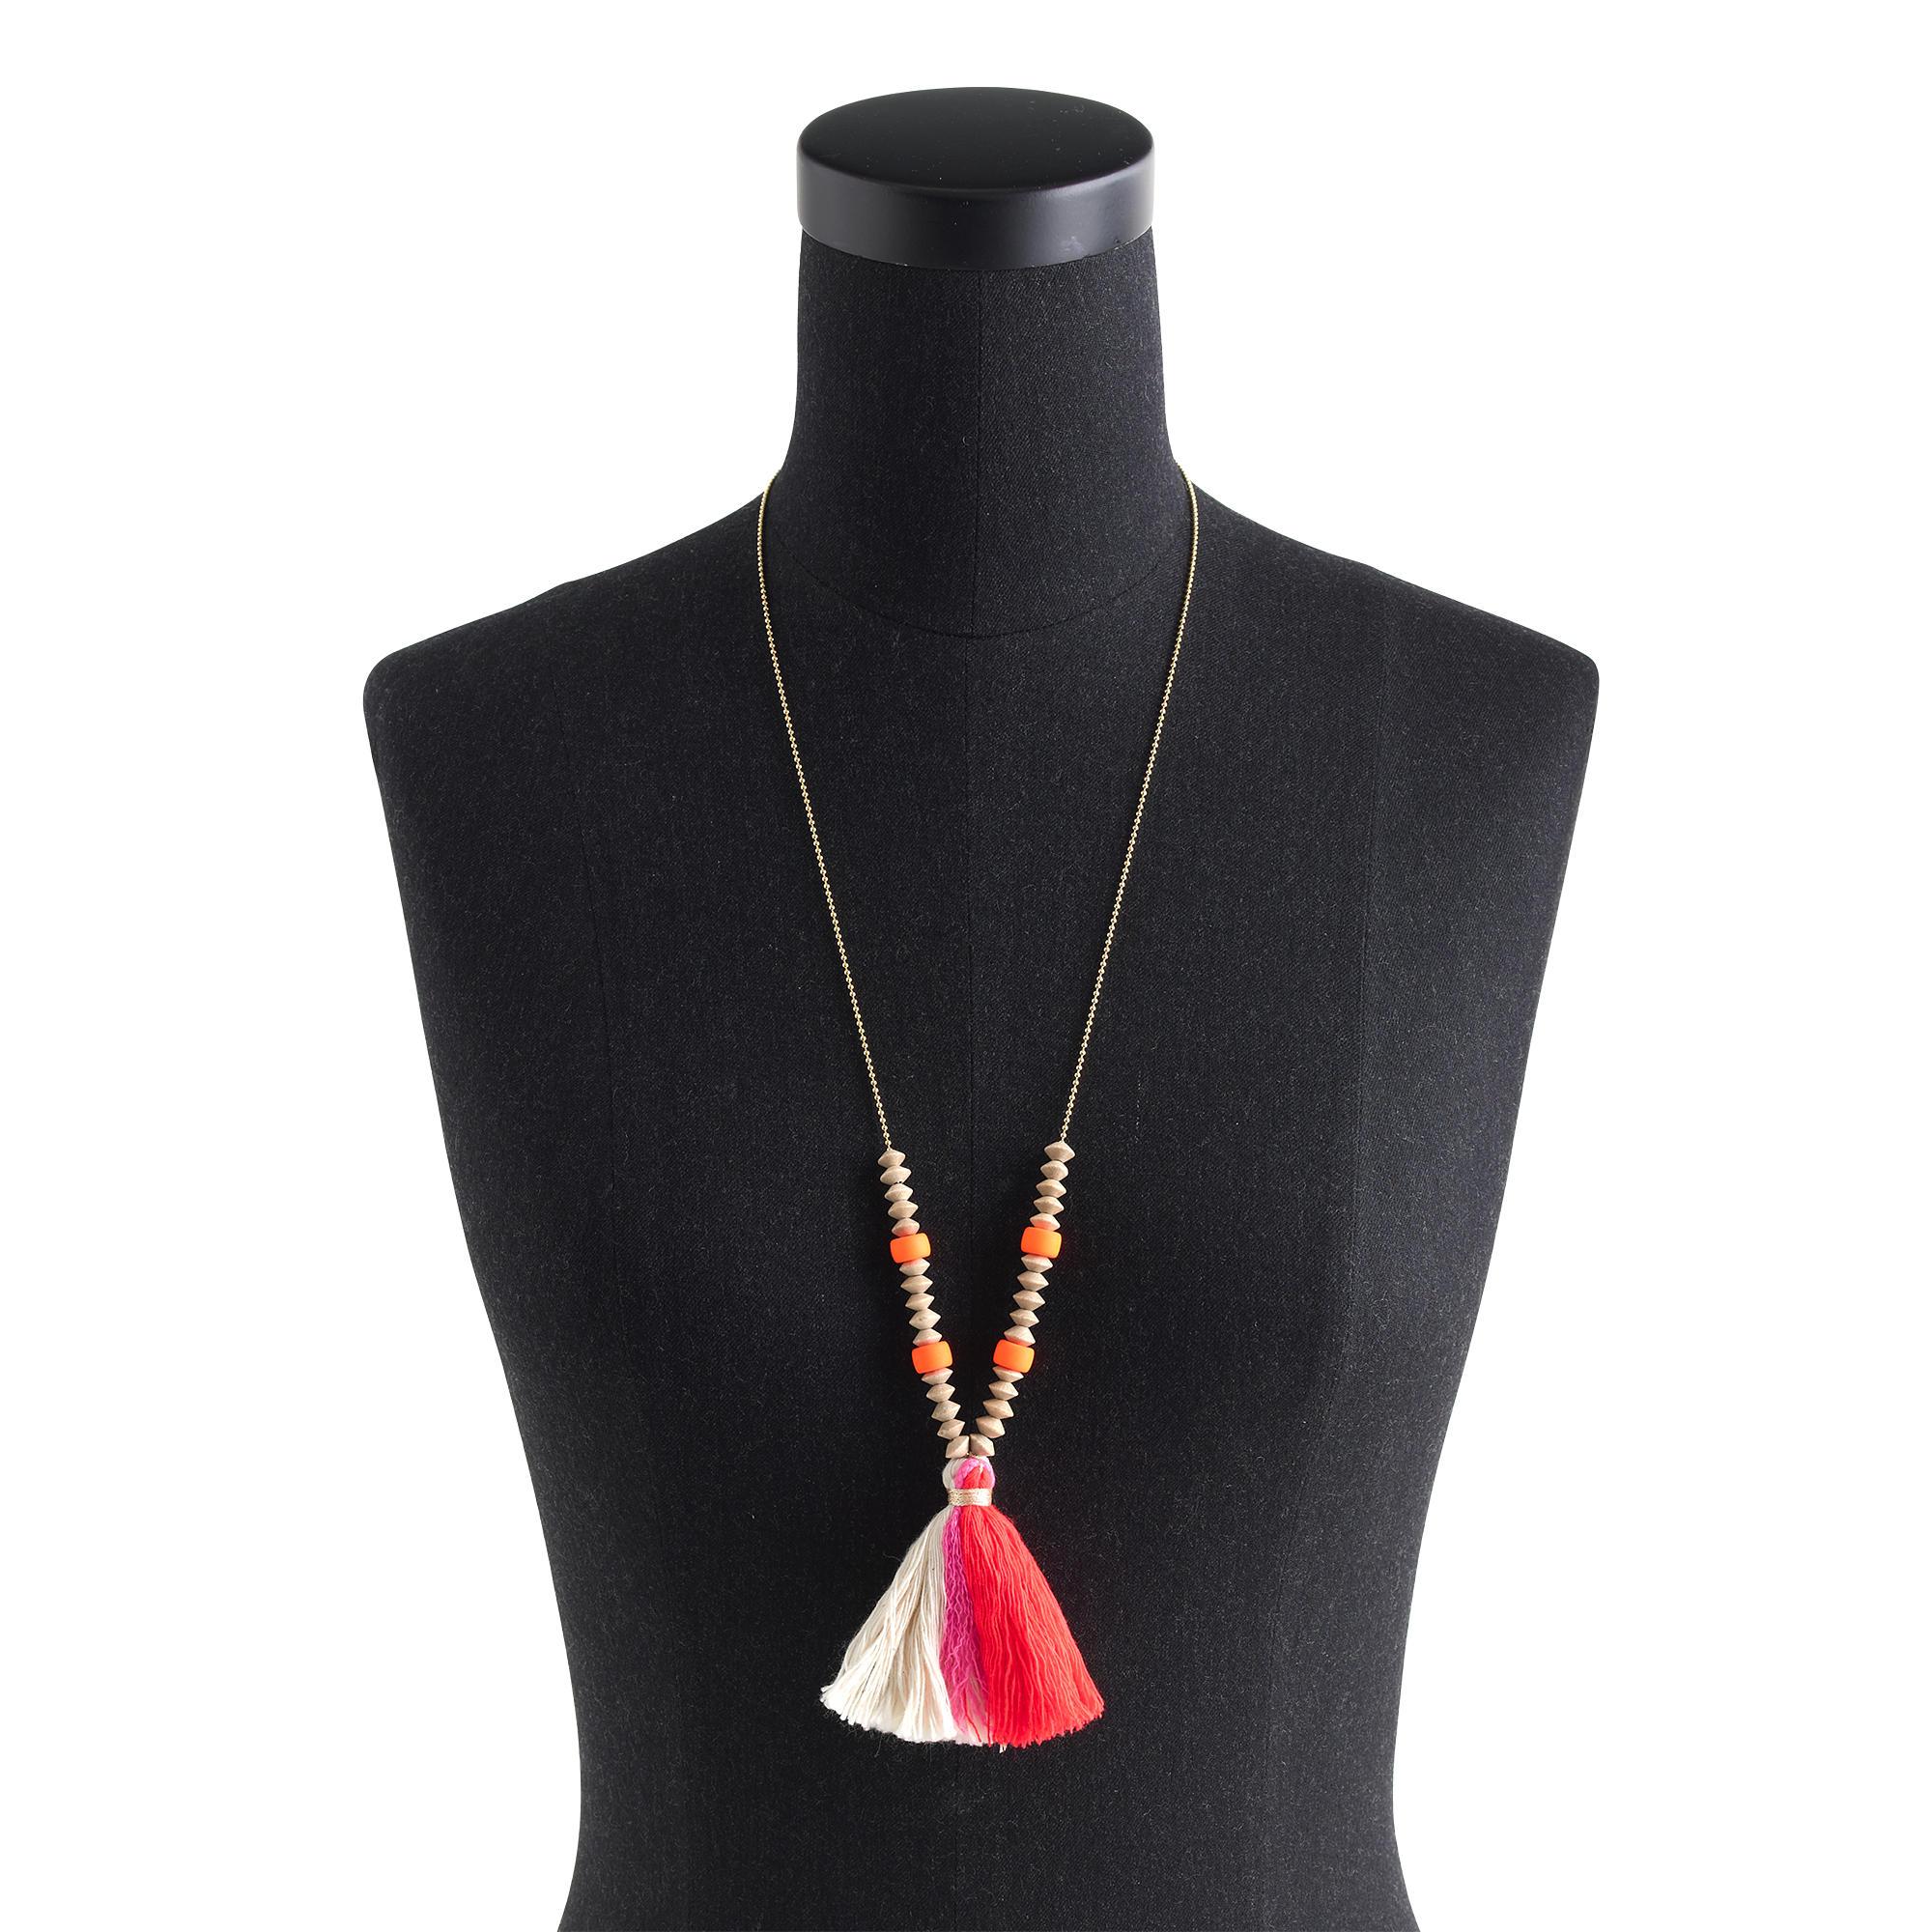 J.Crew Bluma Project Lolo Tassel Necklace in Orange Pink Red (Orange)